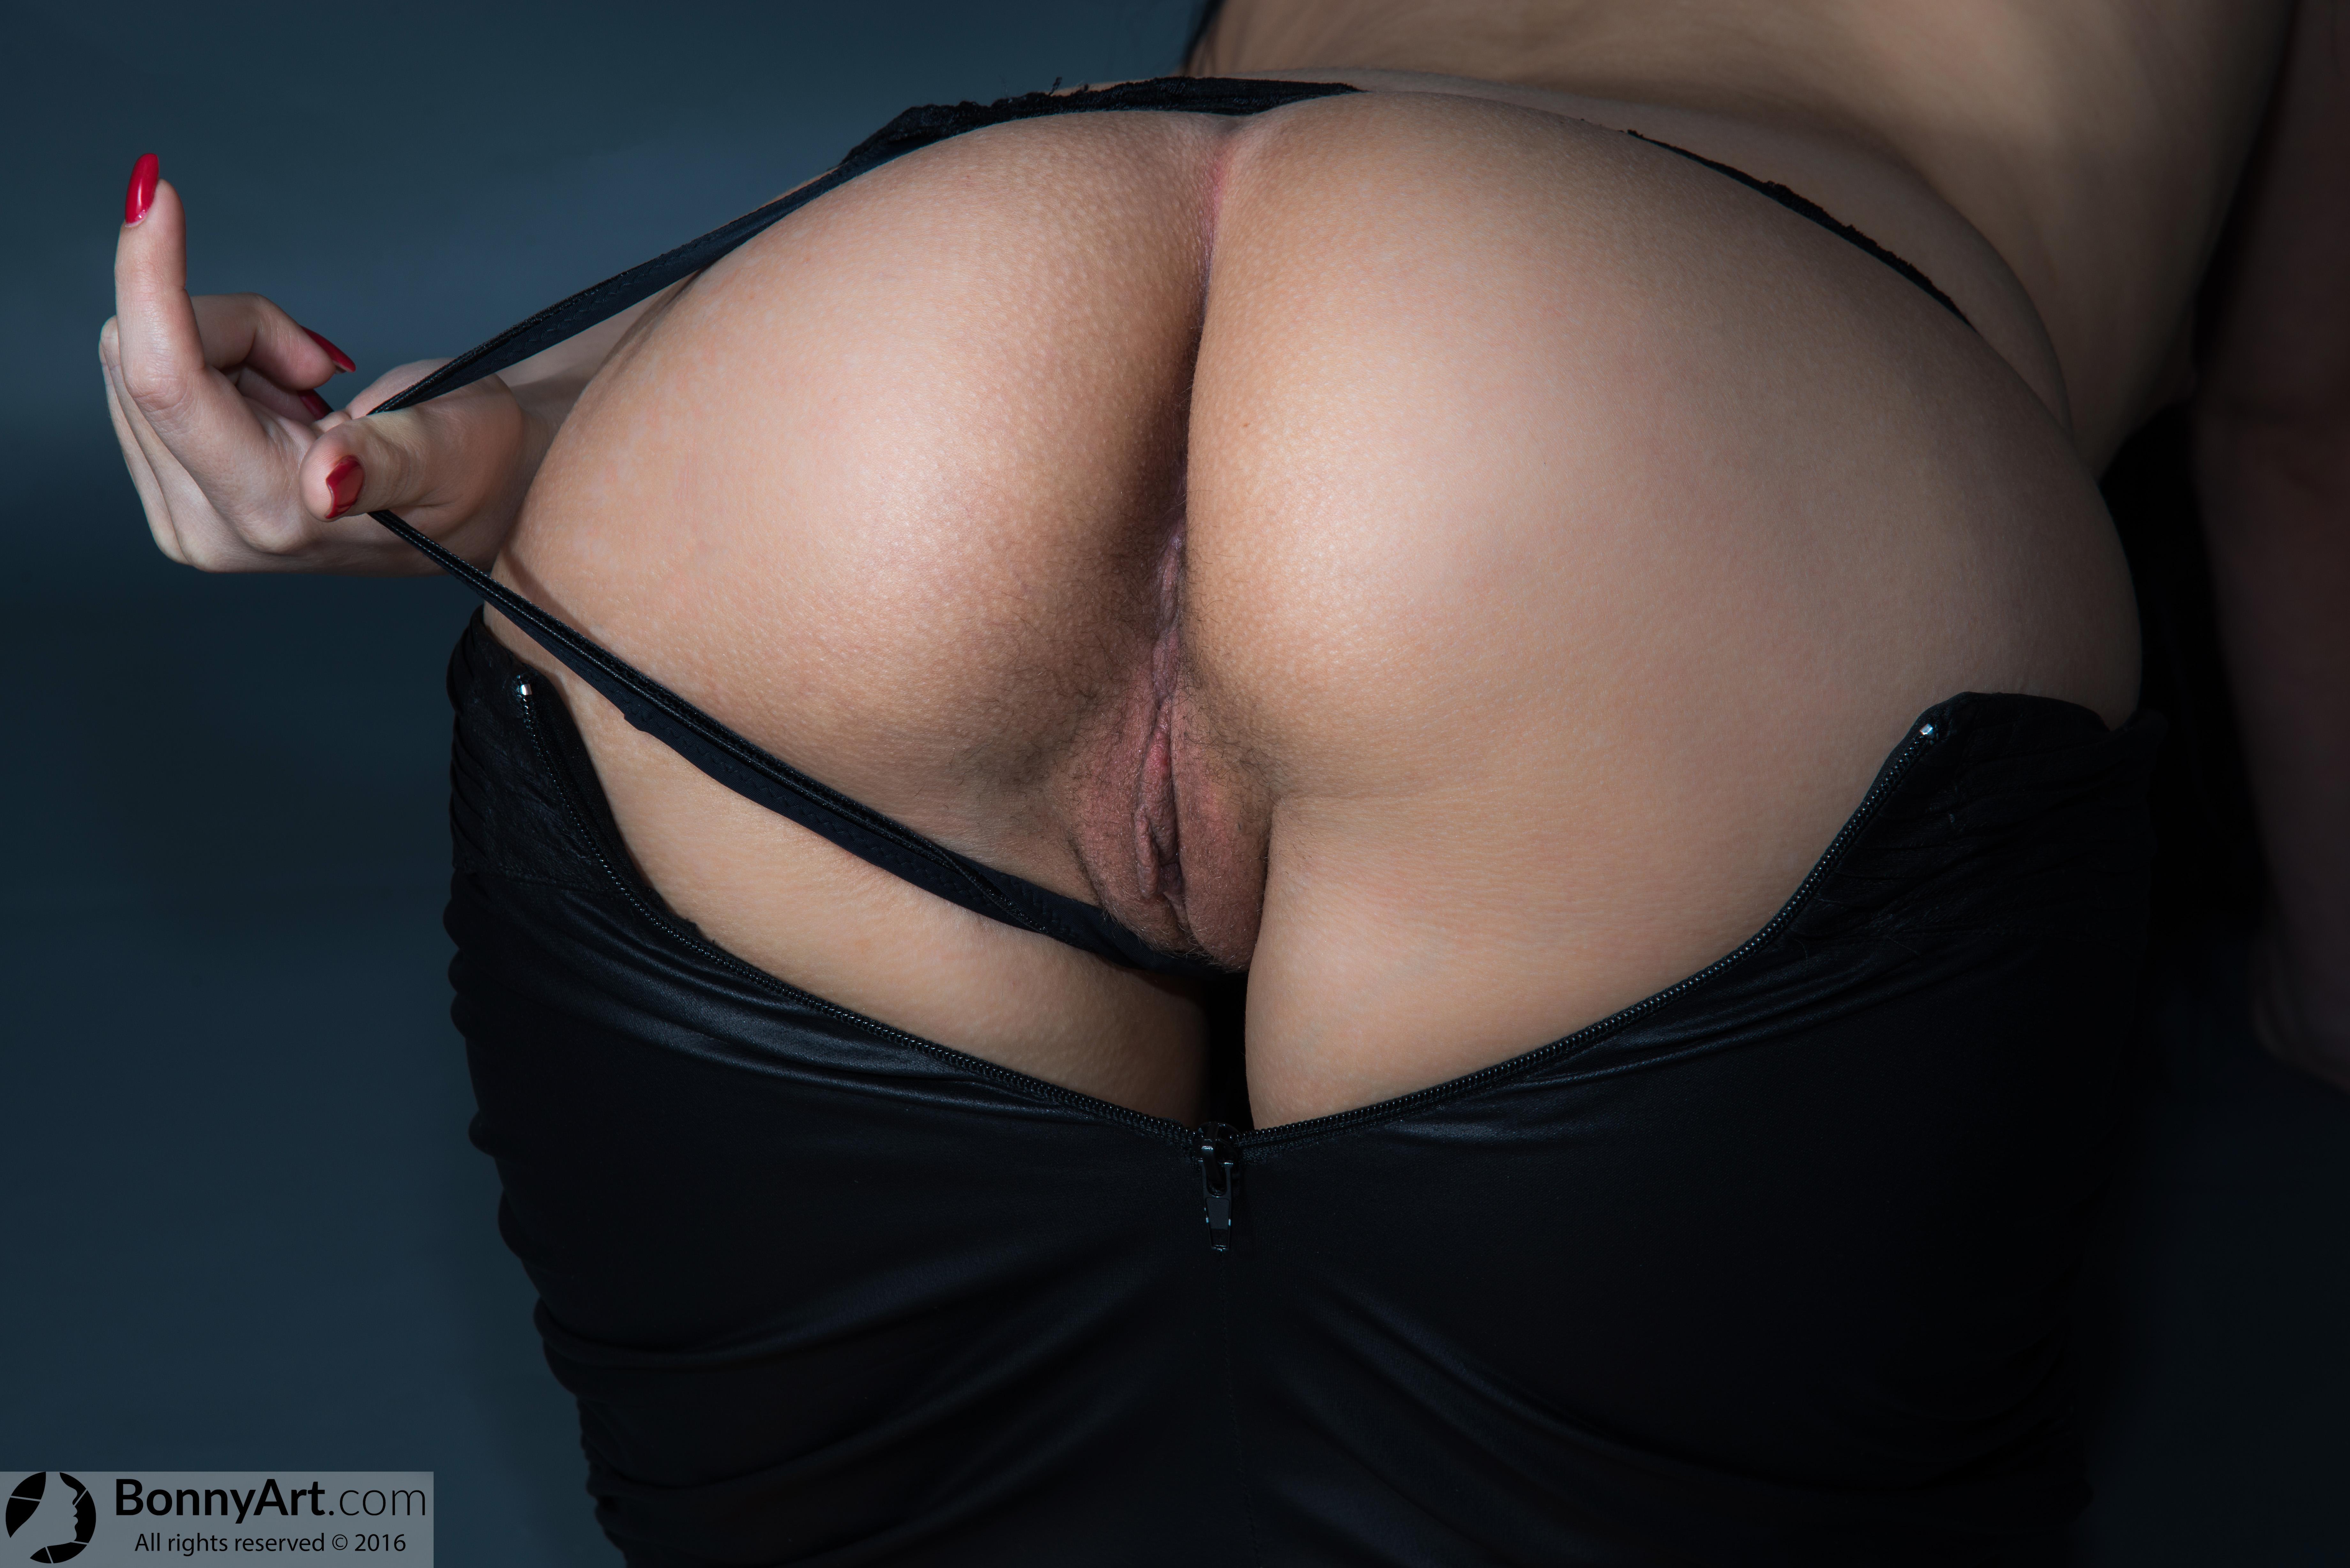 Pulling Thong Off White American Vulva Unzipped